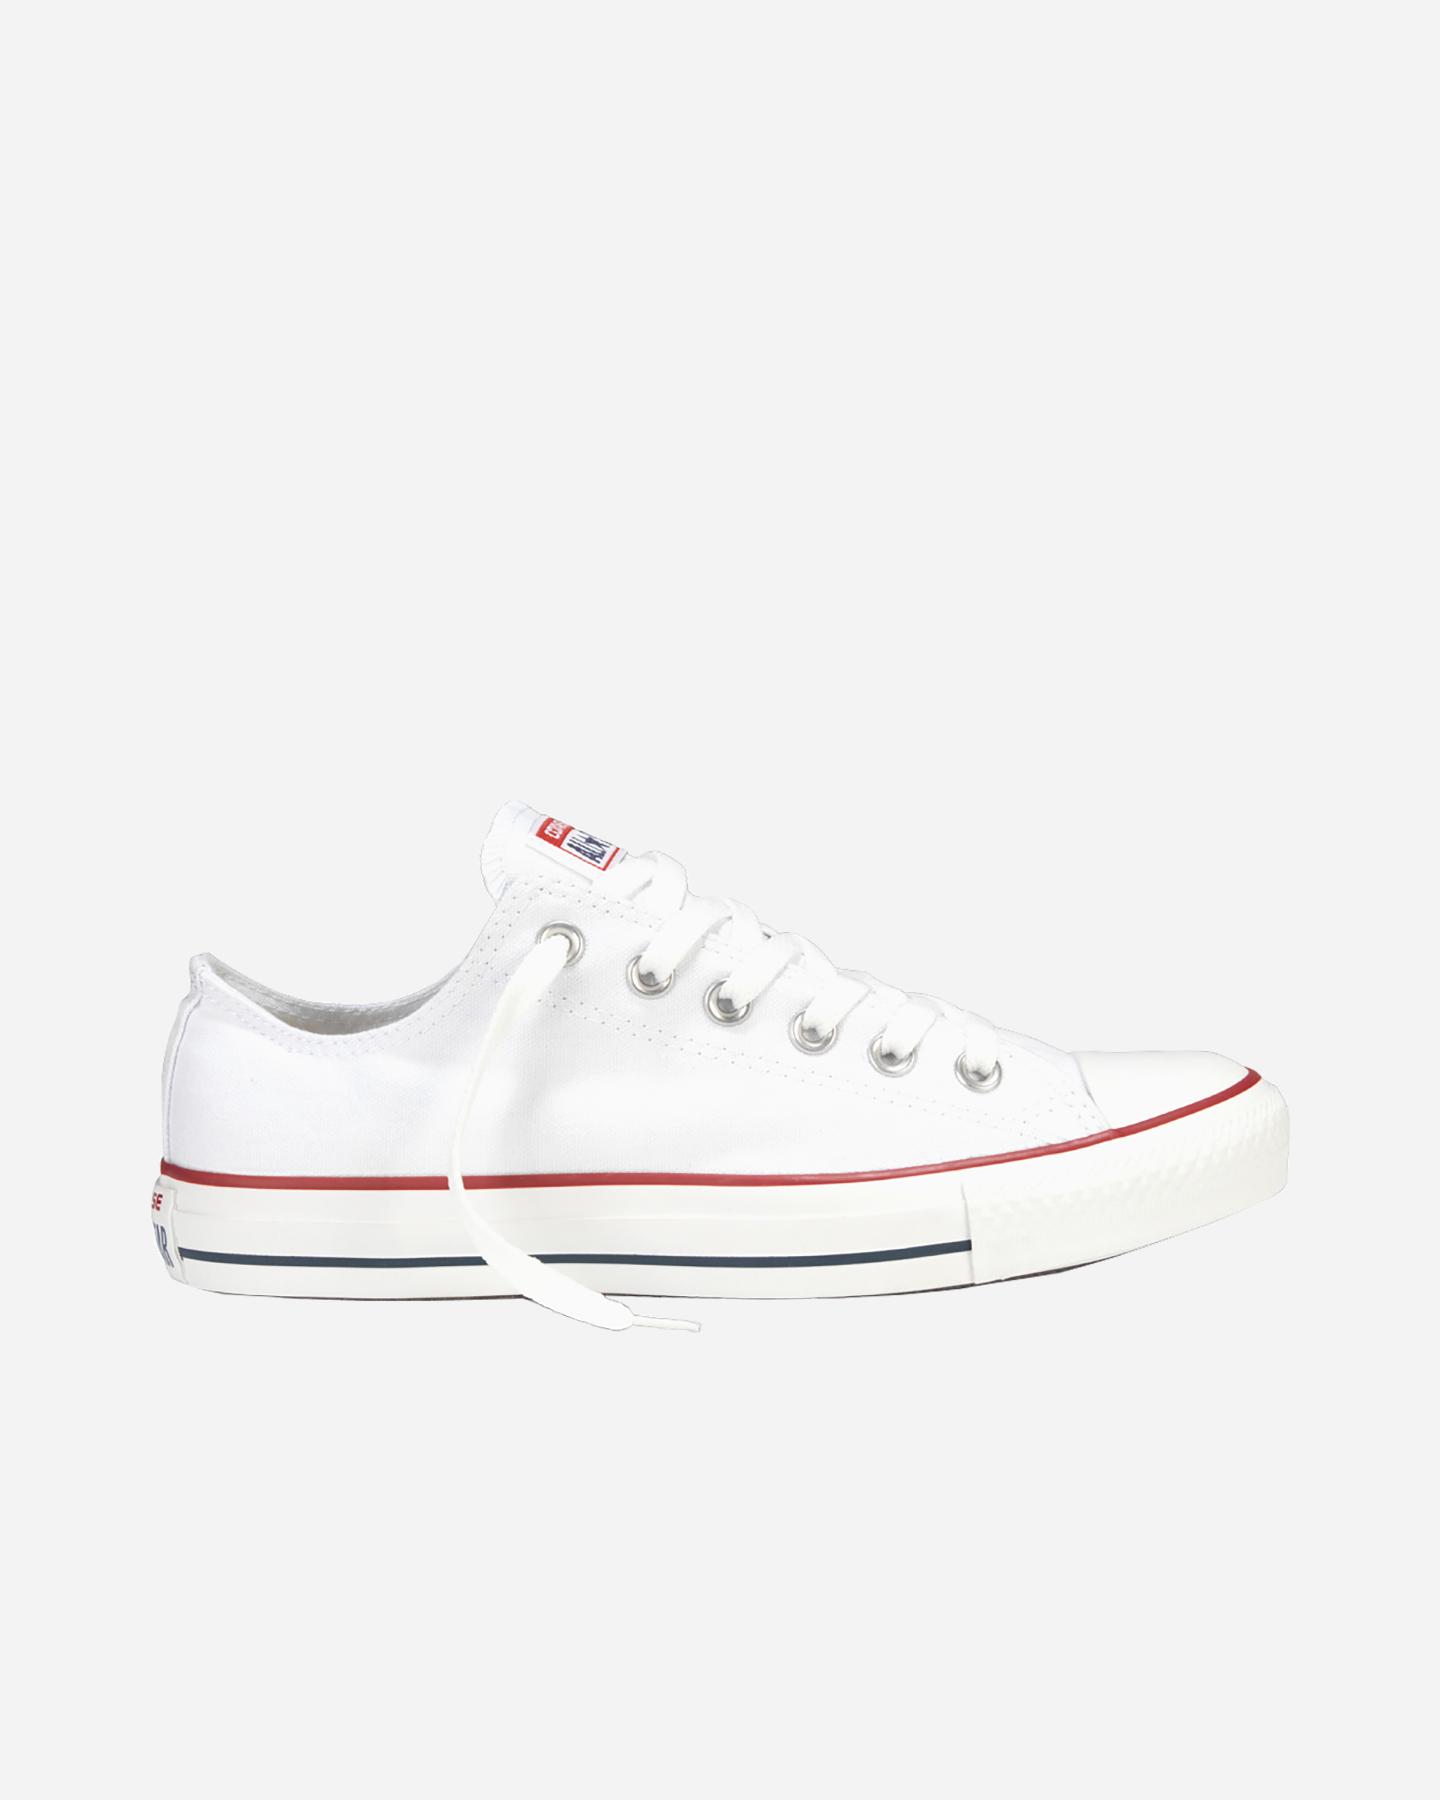 All M Scarpe Sneakers Xm9166 Converse Ox Star Taylor Su Chuck PqXxcw7TE